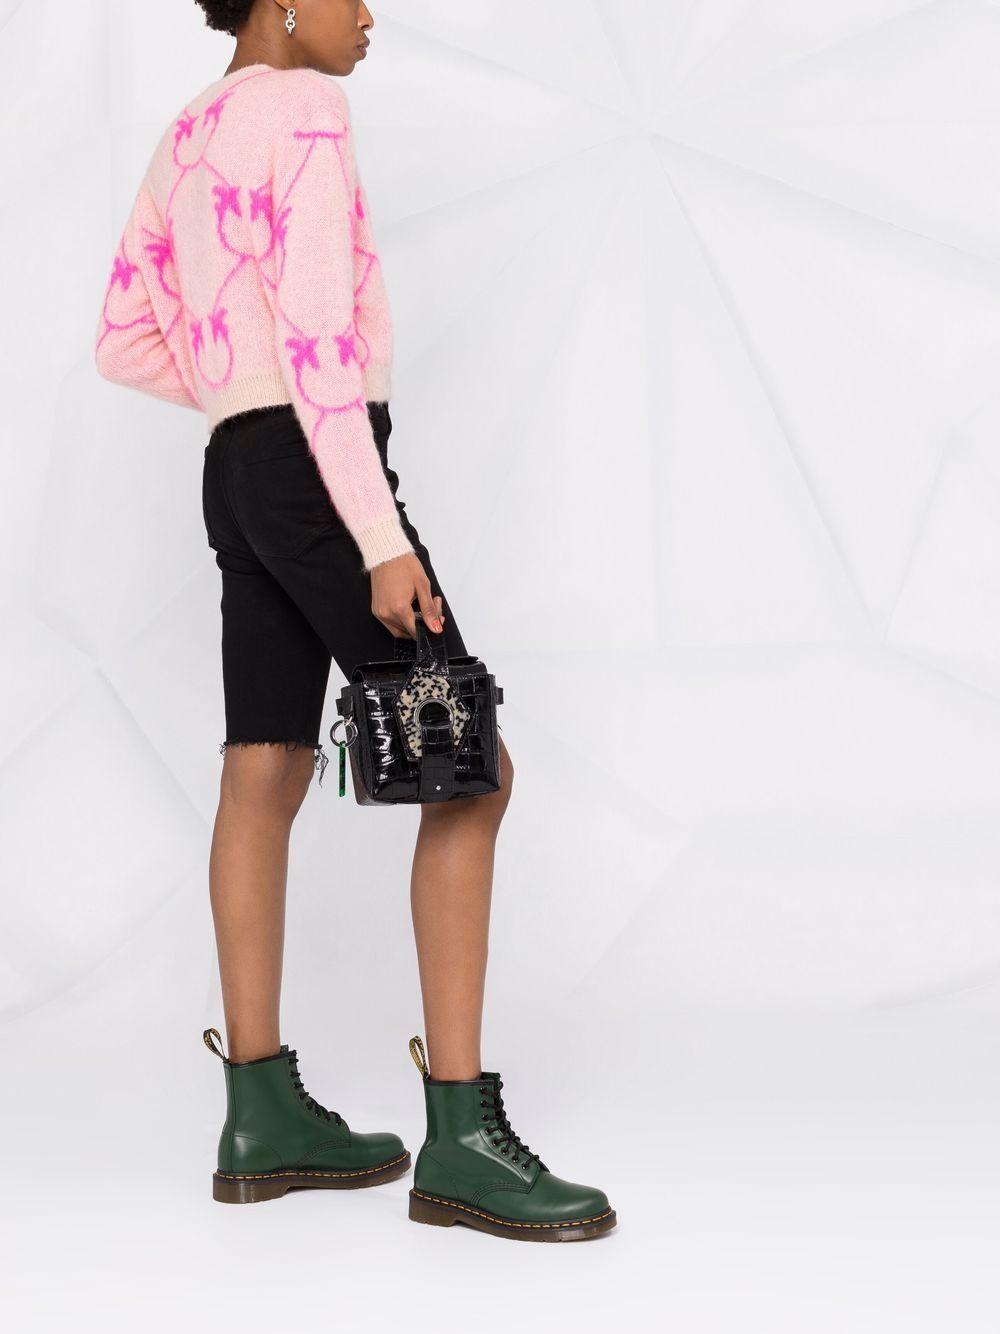 Cardigan in lana mohair rosa con monogramma fuxia Pinko PINKO | Cardigan | 1G16WR-Y7G4NN0